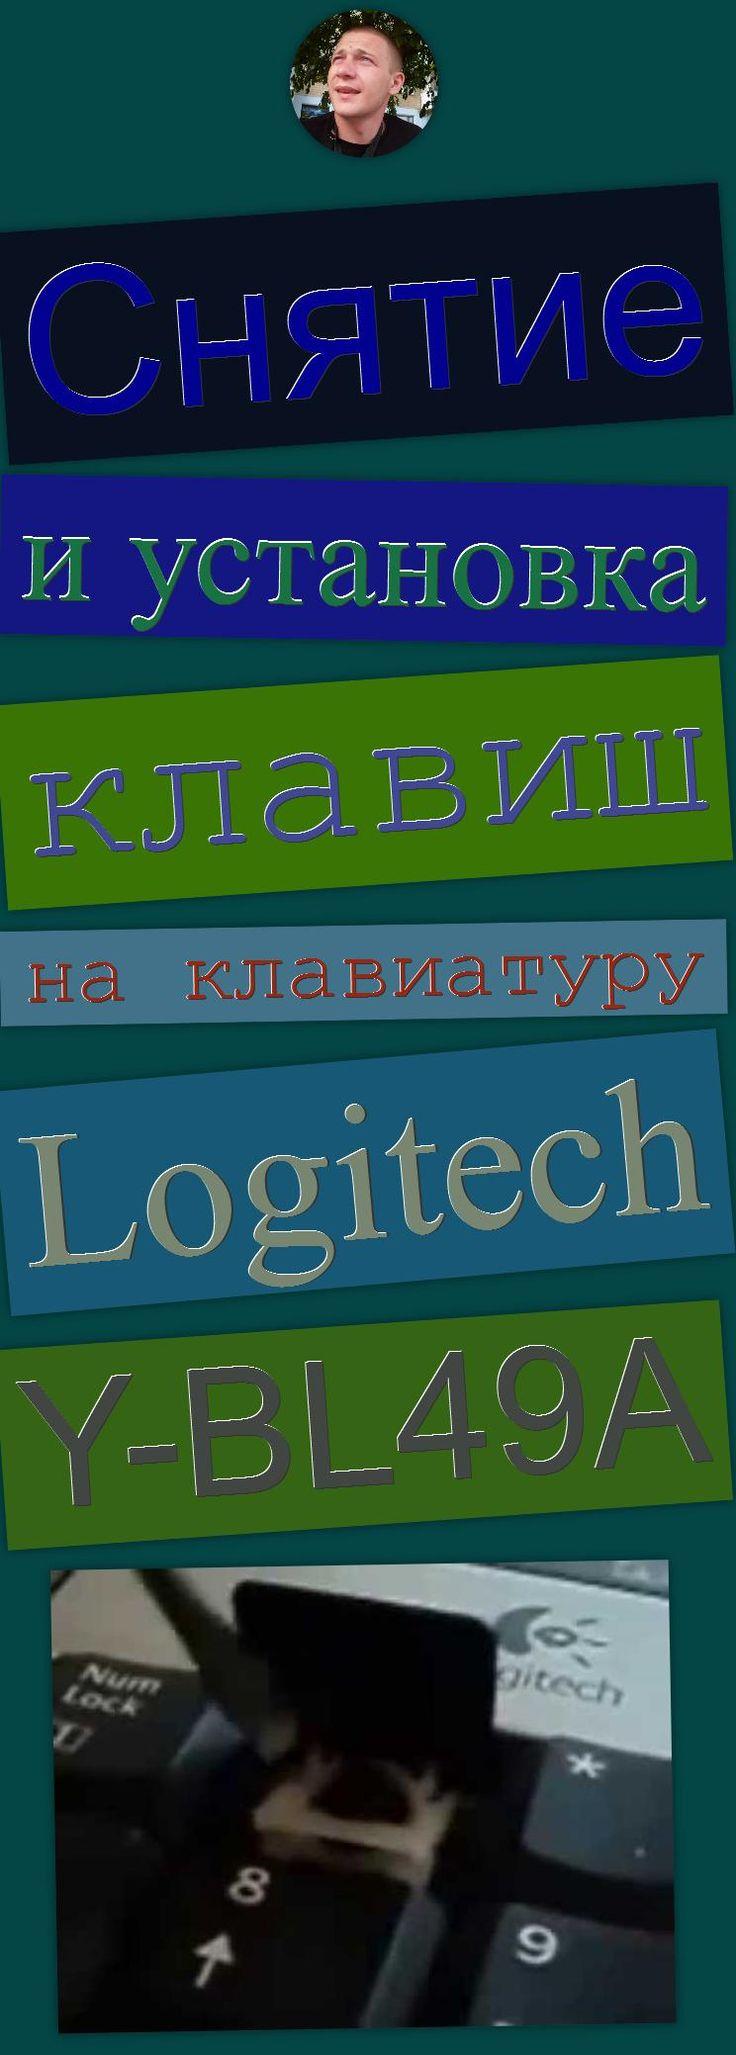 Снятие и установка клавиш на клавиатуру Logitech Y-BL49A Racing Video Game (Video Game Genre), Push-button, демонтаж клавиш, установка, монтаж клавиш, клавишы, Logitech, крепление клавиш, Toetsenbord, ультра тонкие клавиши, снятие